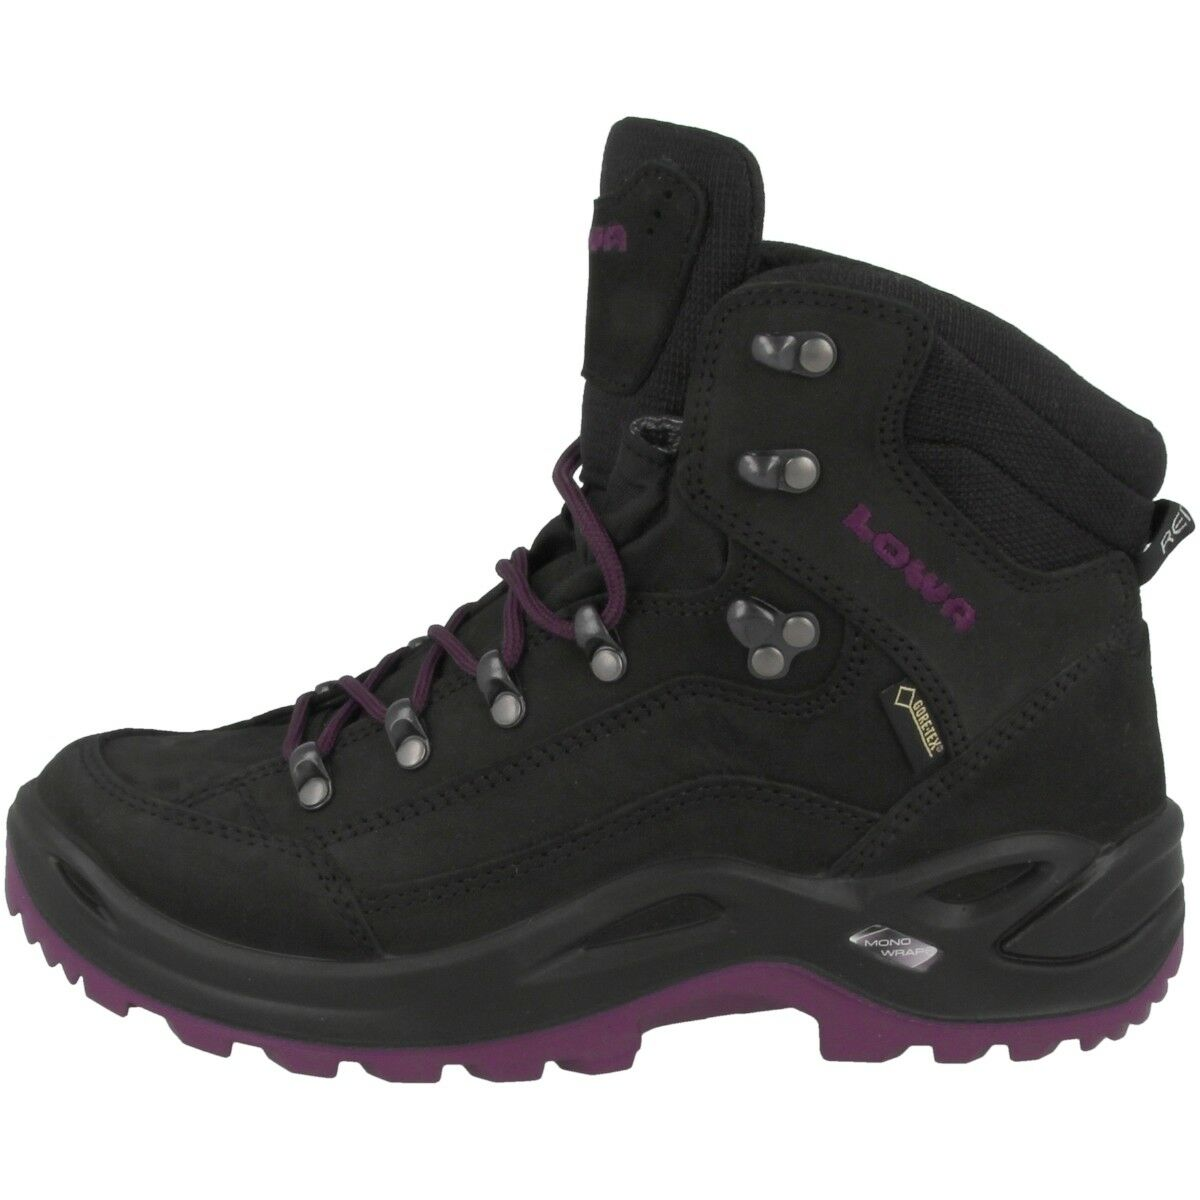 Lowa Renegade GTX Scarponcino Donne Gore-Tex Esterno Trekking shoes Nere